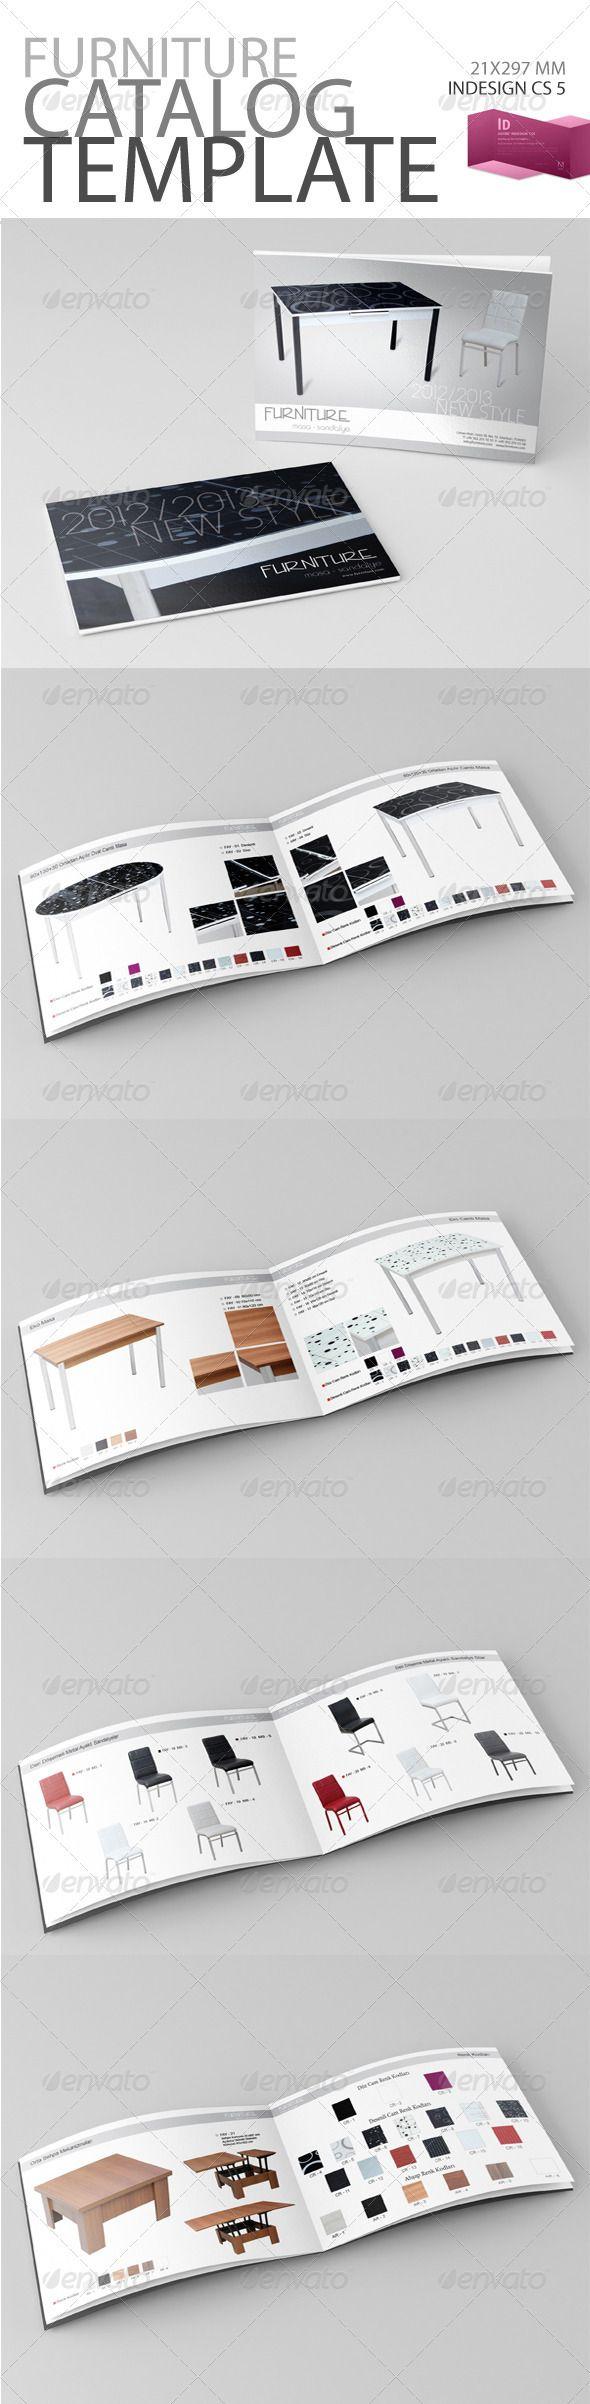 brochure templates for photoshop cs5 - 25 best ideas about furniture catalog on pinterest